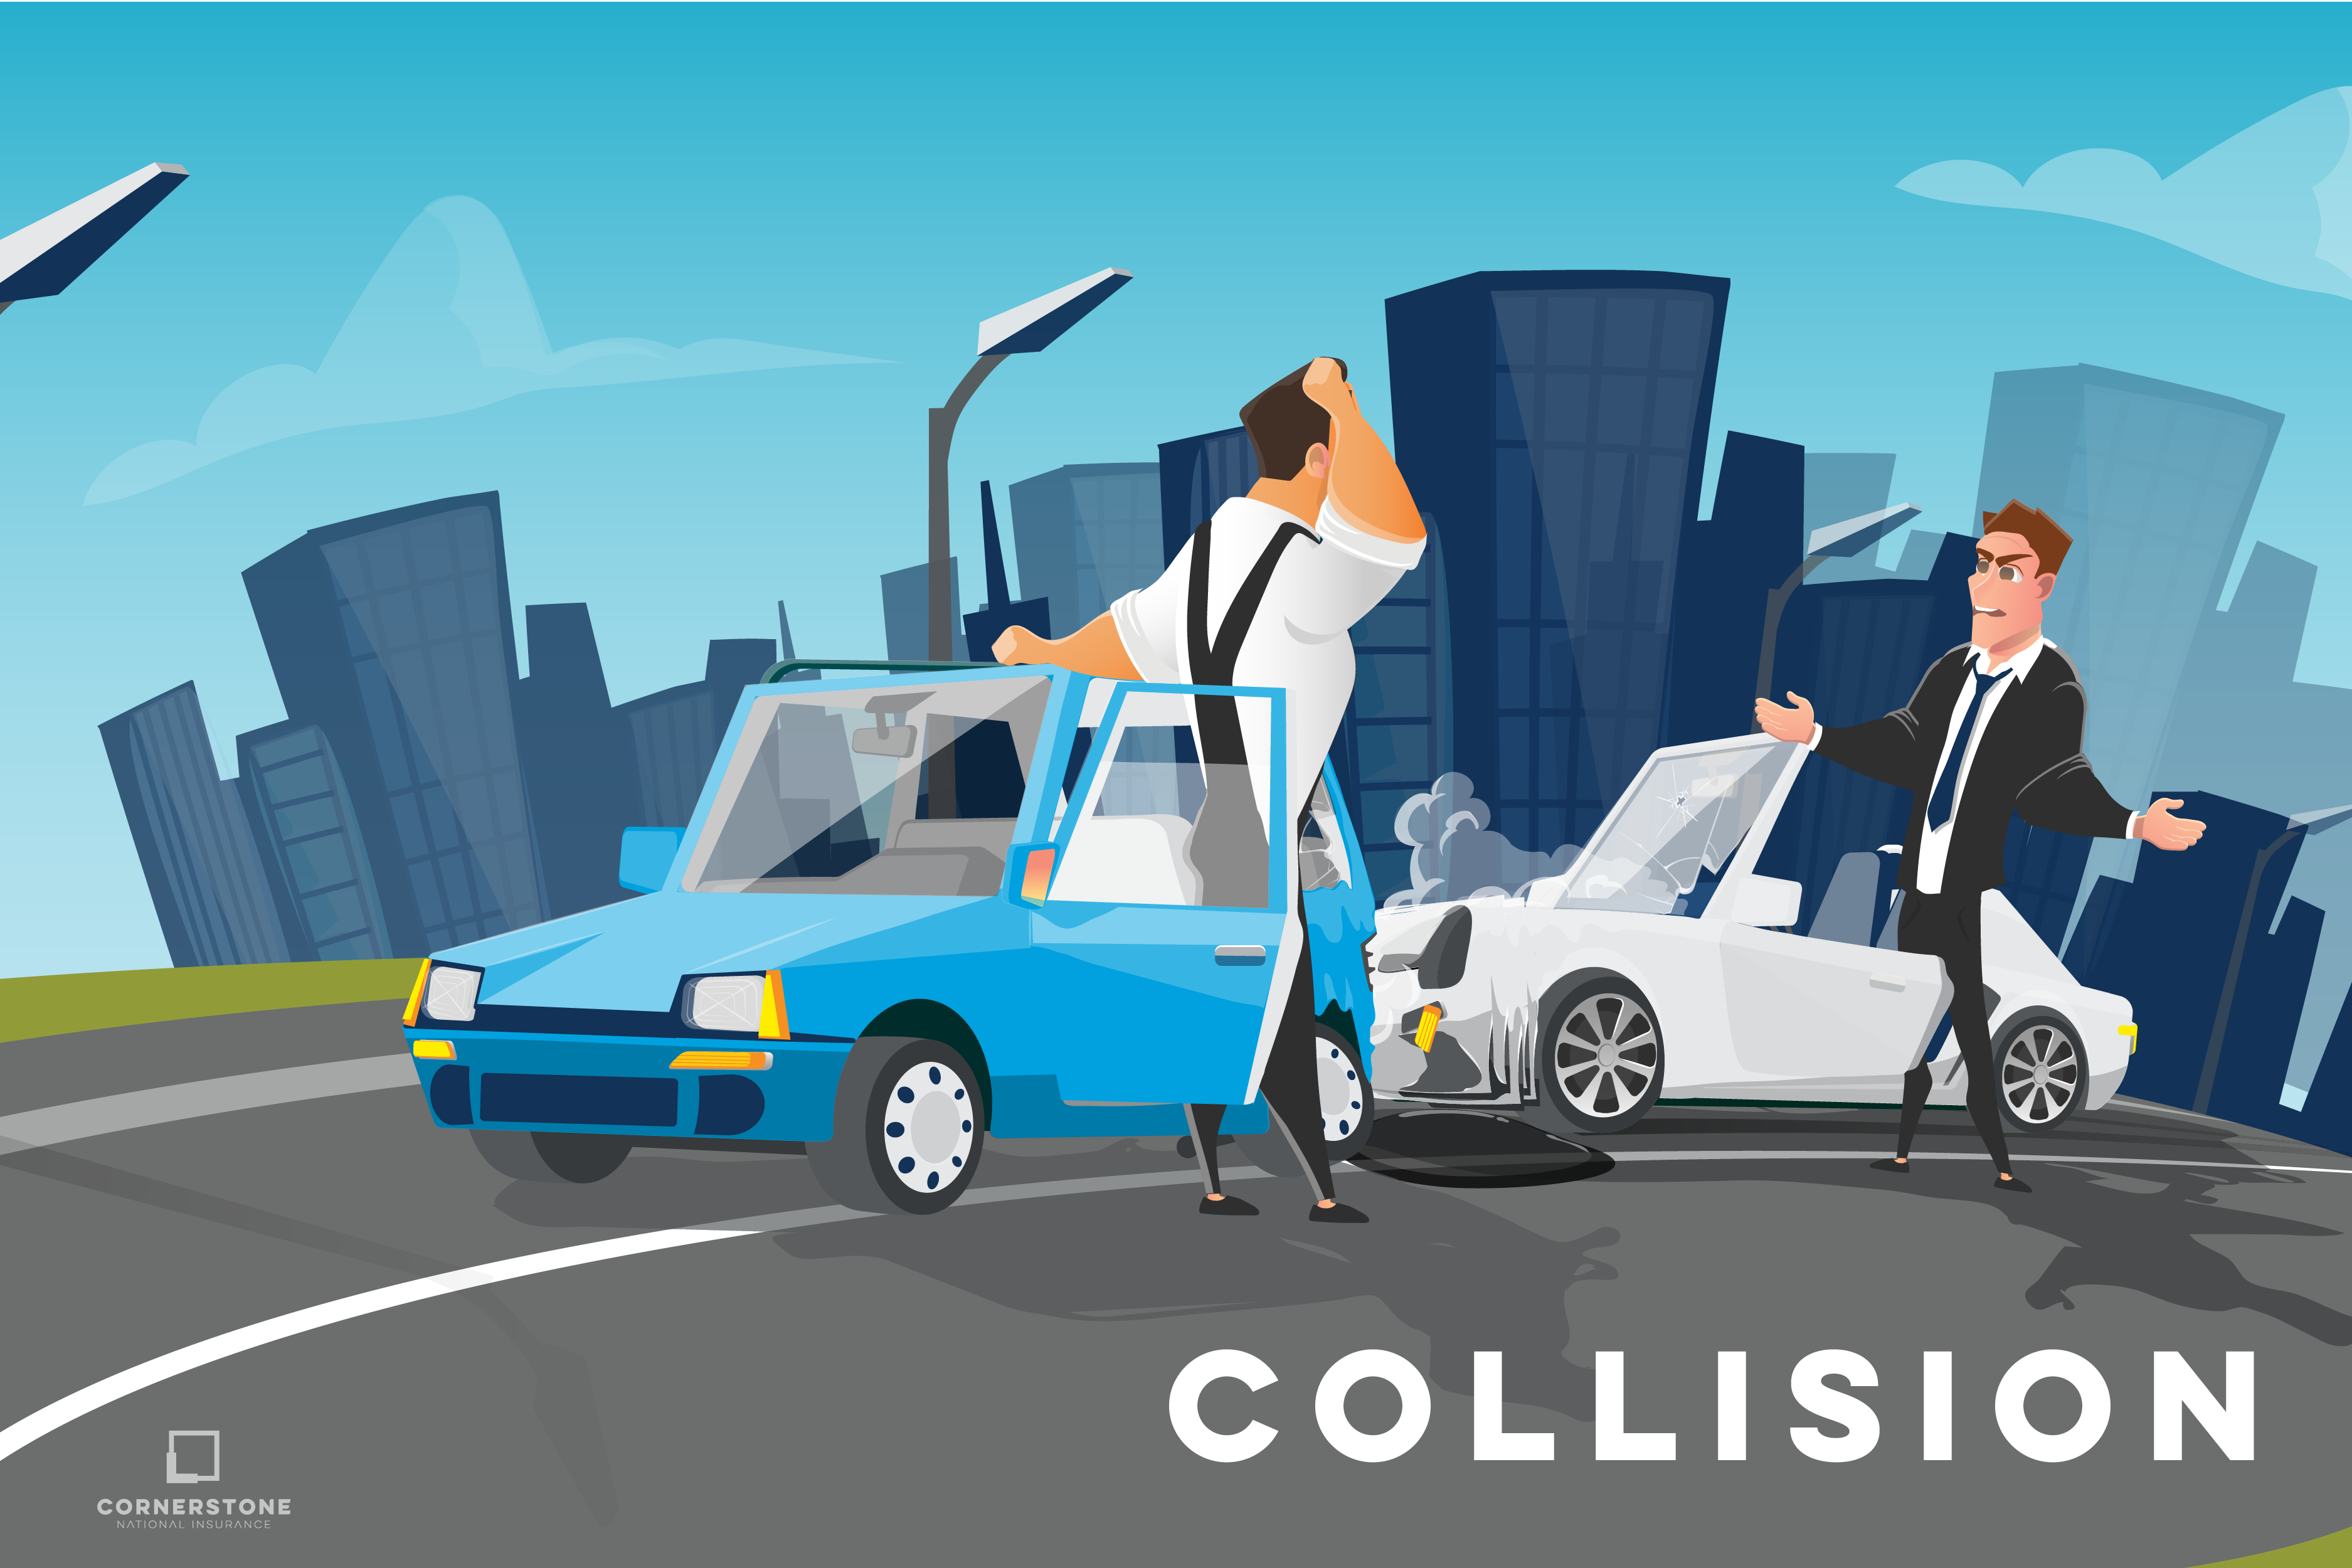 2. CNI_Collision_Blog_Title-01